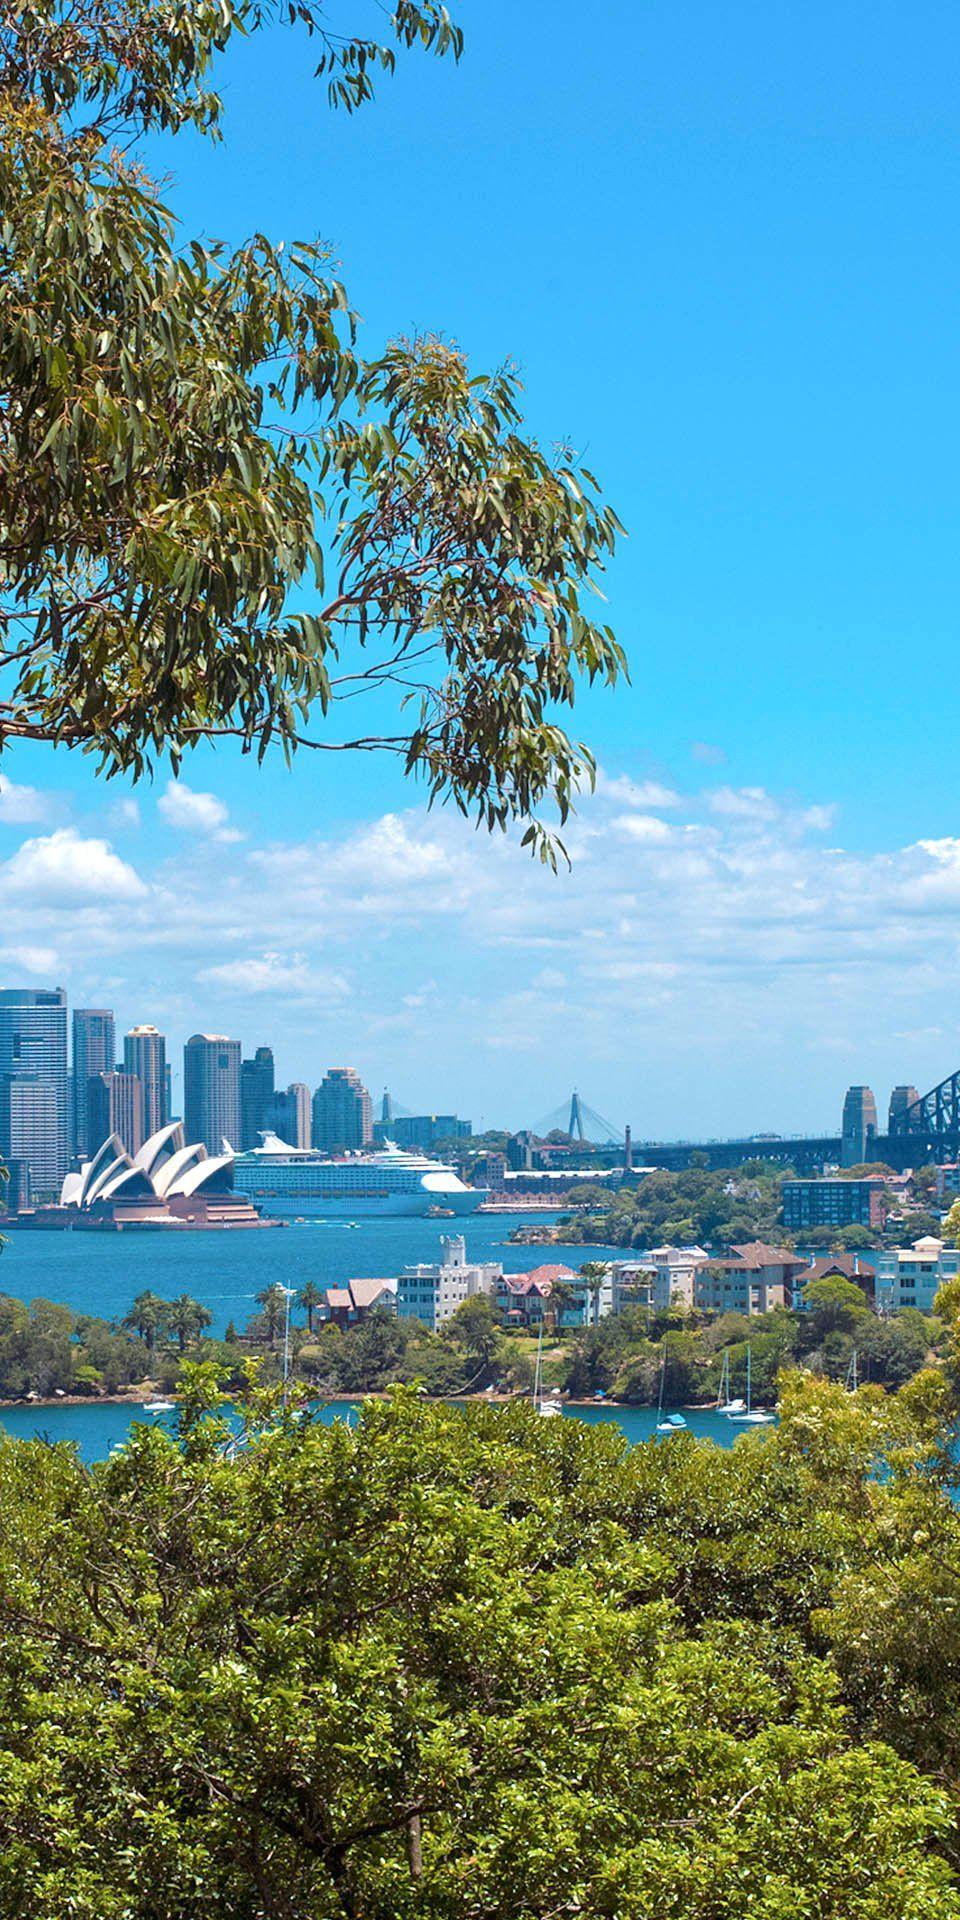 Sydney, Australia | Catch the most amazing views of Circular